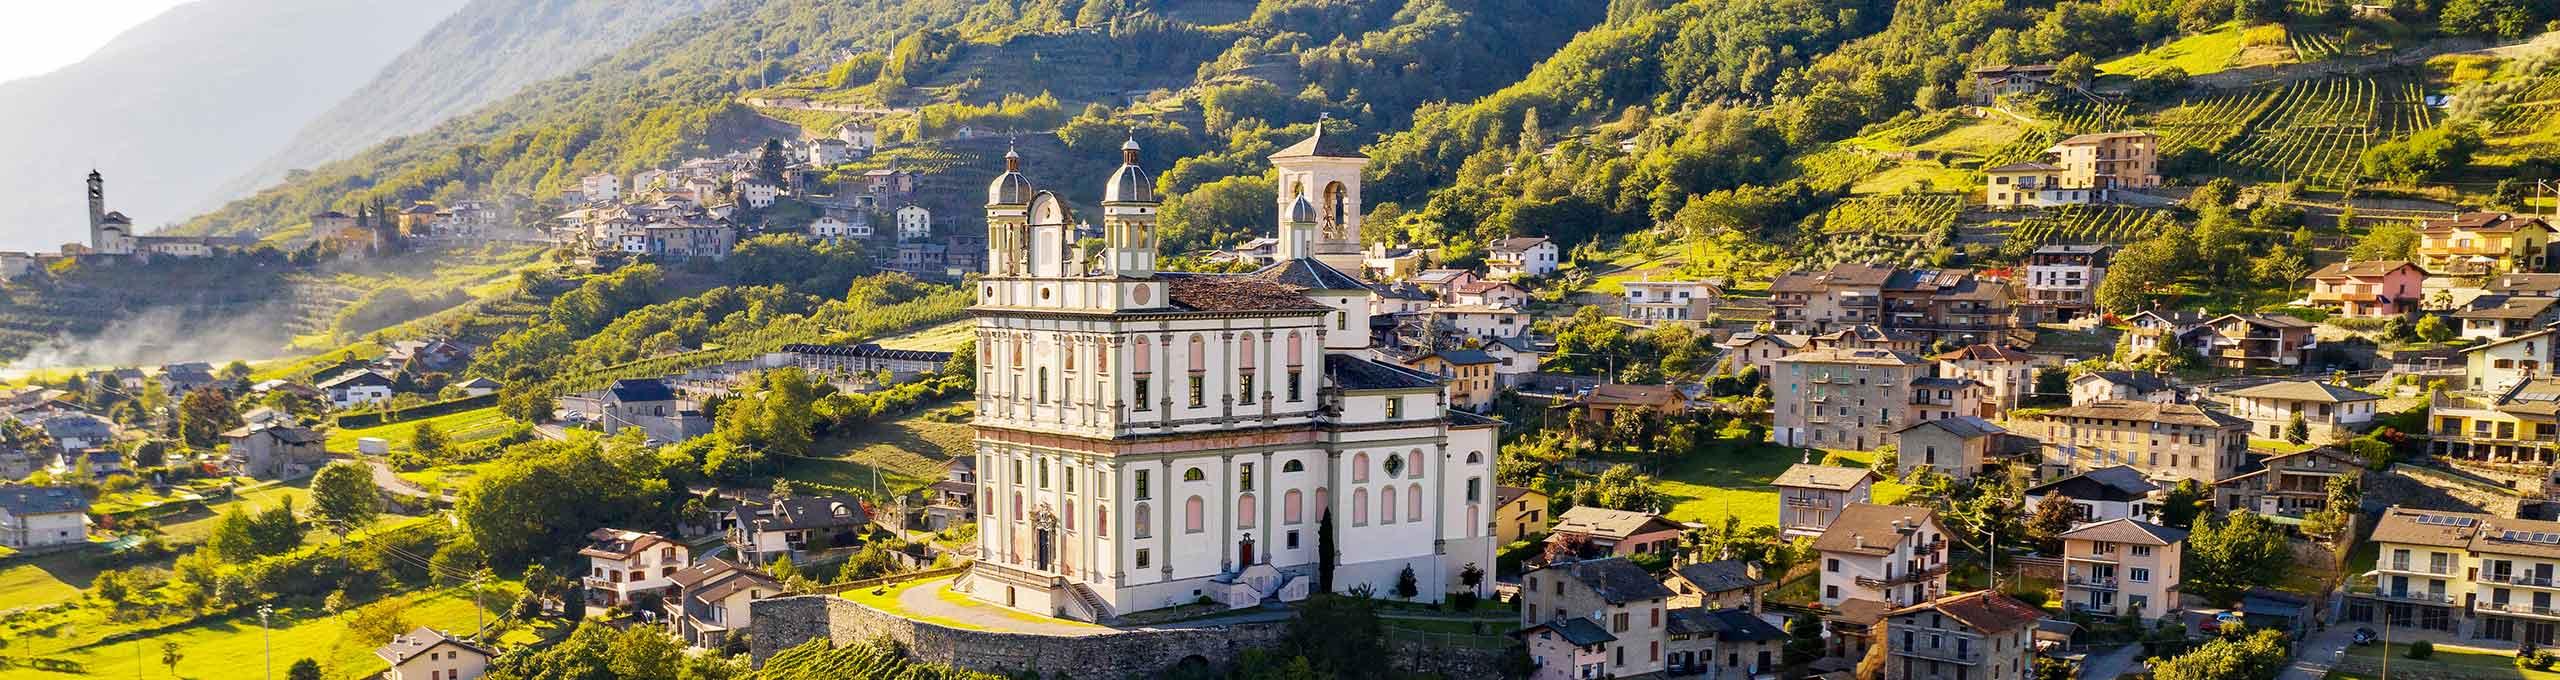 Tresivio, Valtellina, Santuario di Santa Casa Lauretana